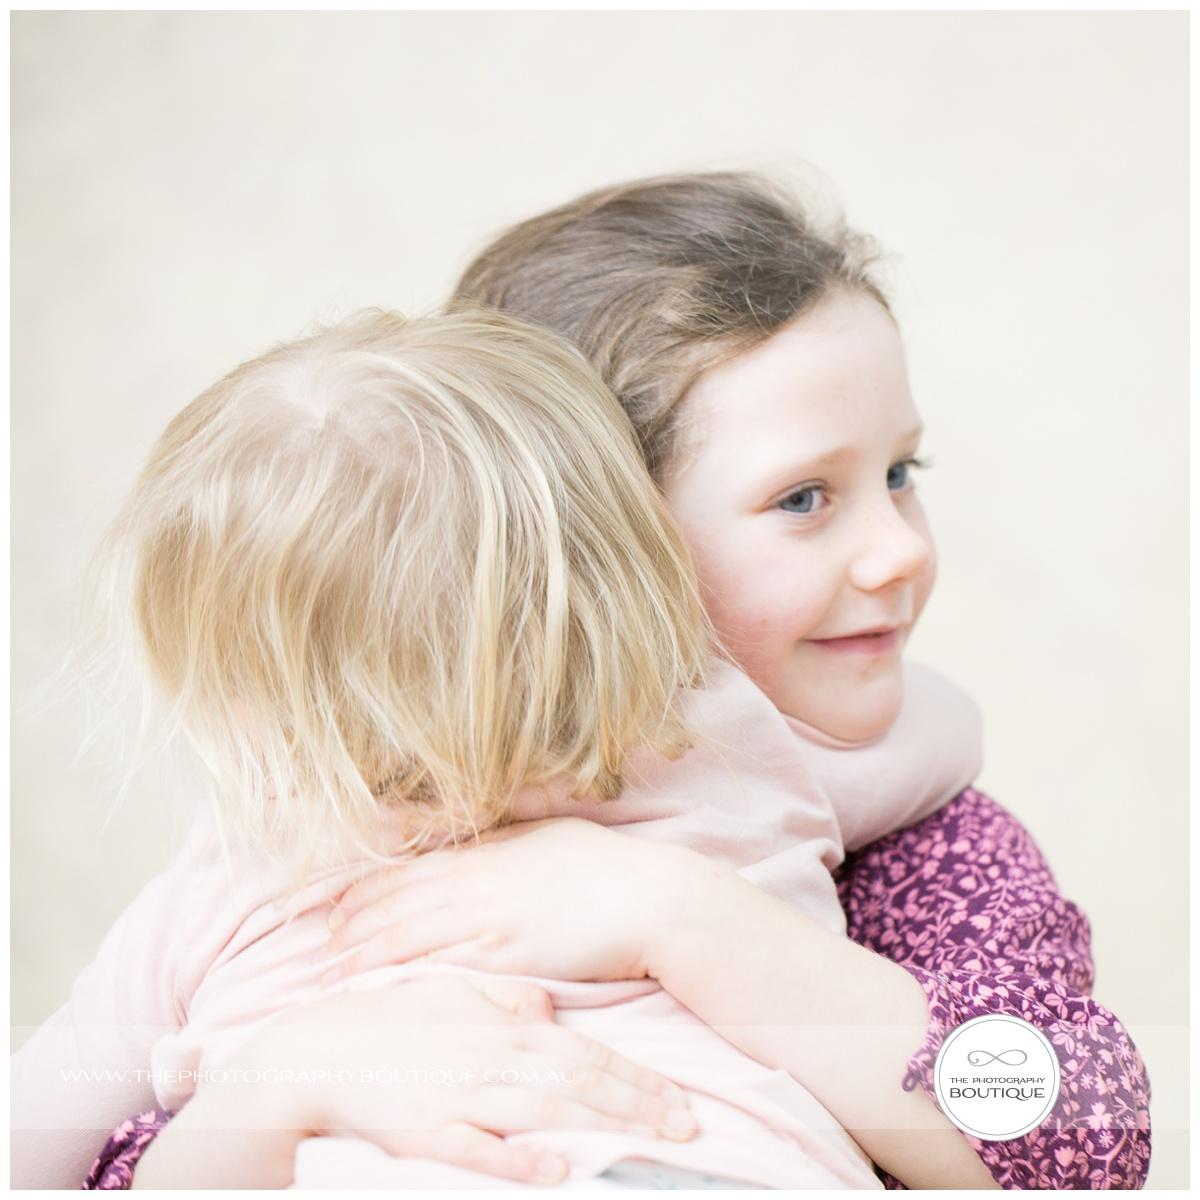 Portrait of Sister's Cuddling